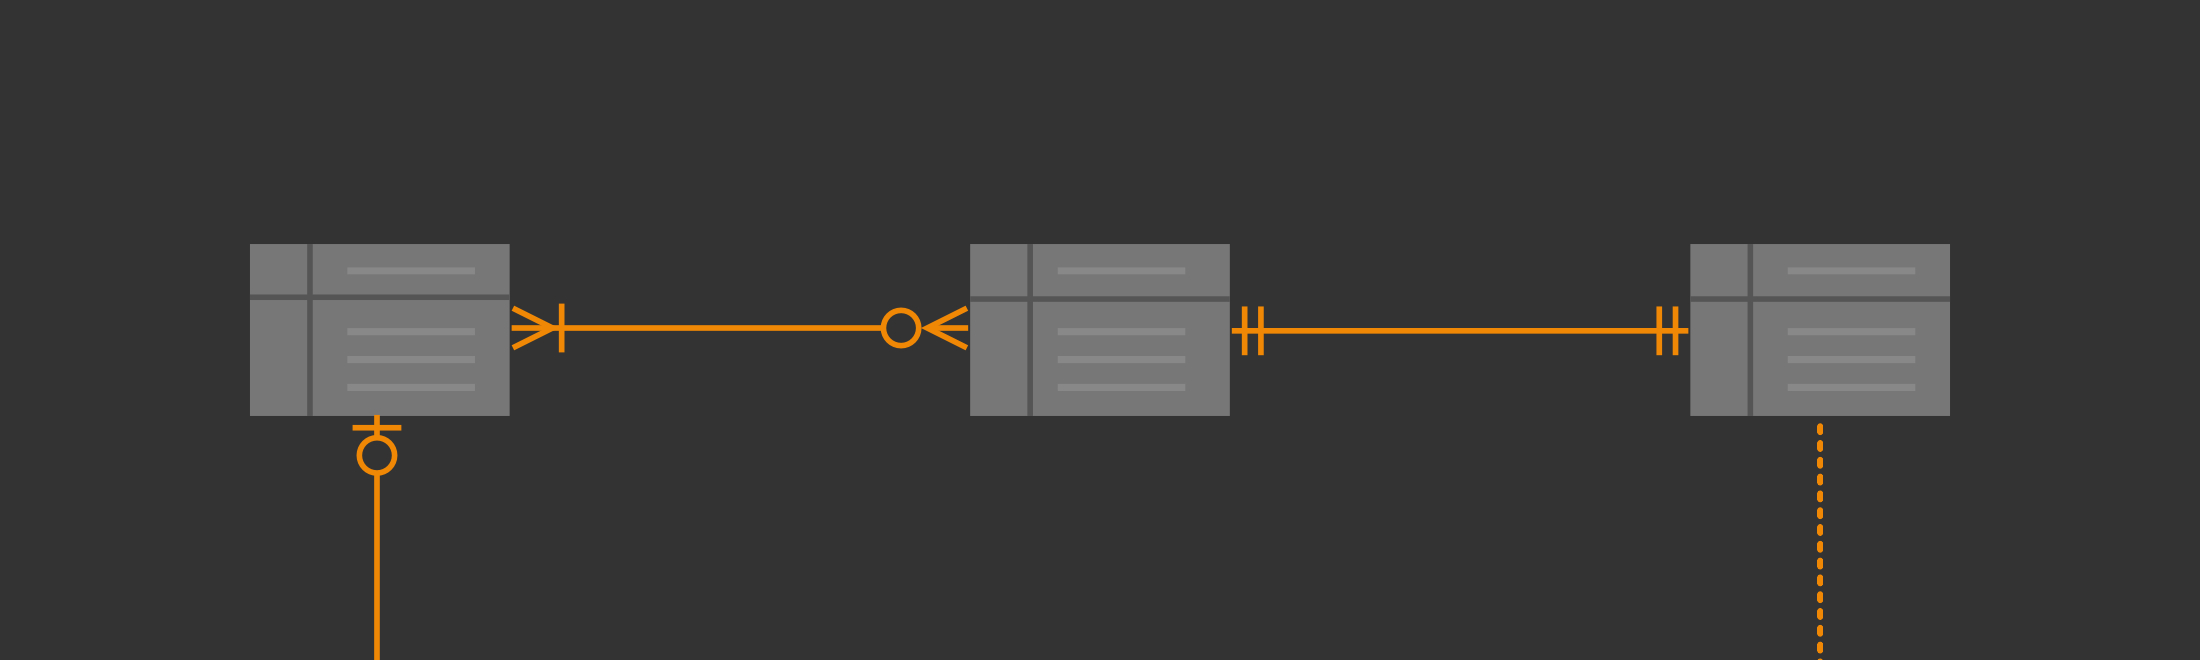 Entity Relationship Diagrams With Draw.io – Draw.io in Data Model Relationship Symbols